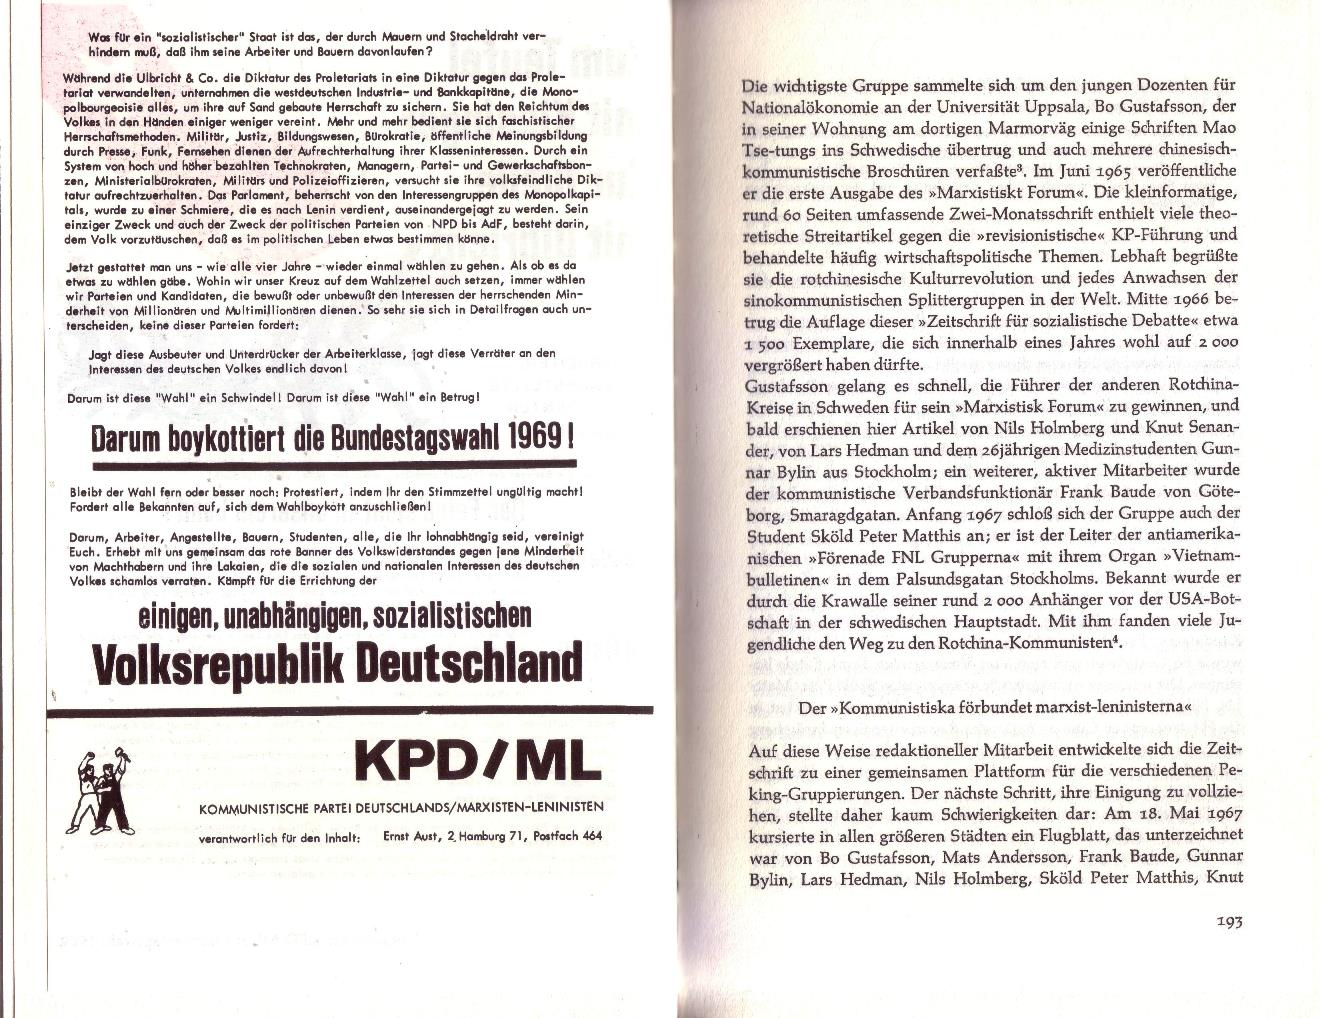 Schlomann_Friedlingstein_Die_Maoisten_0100